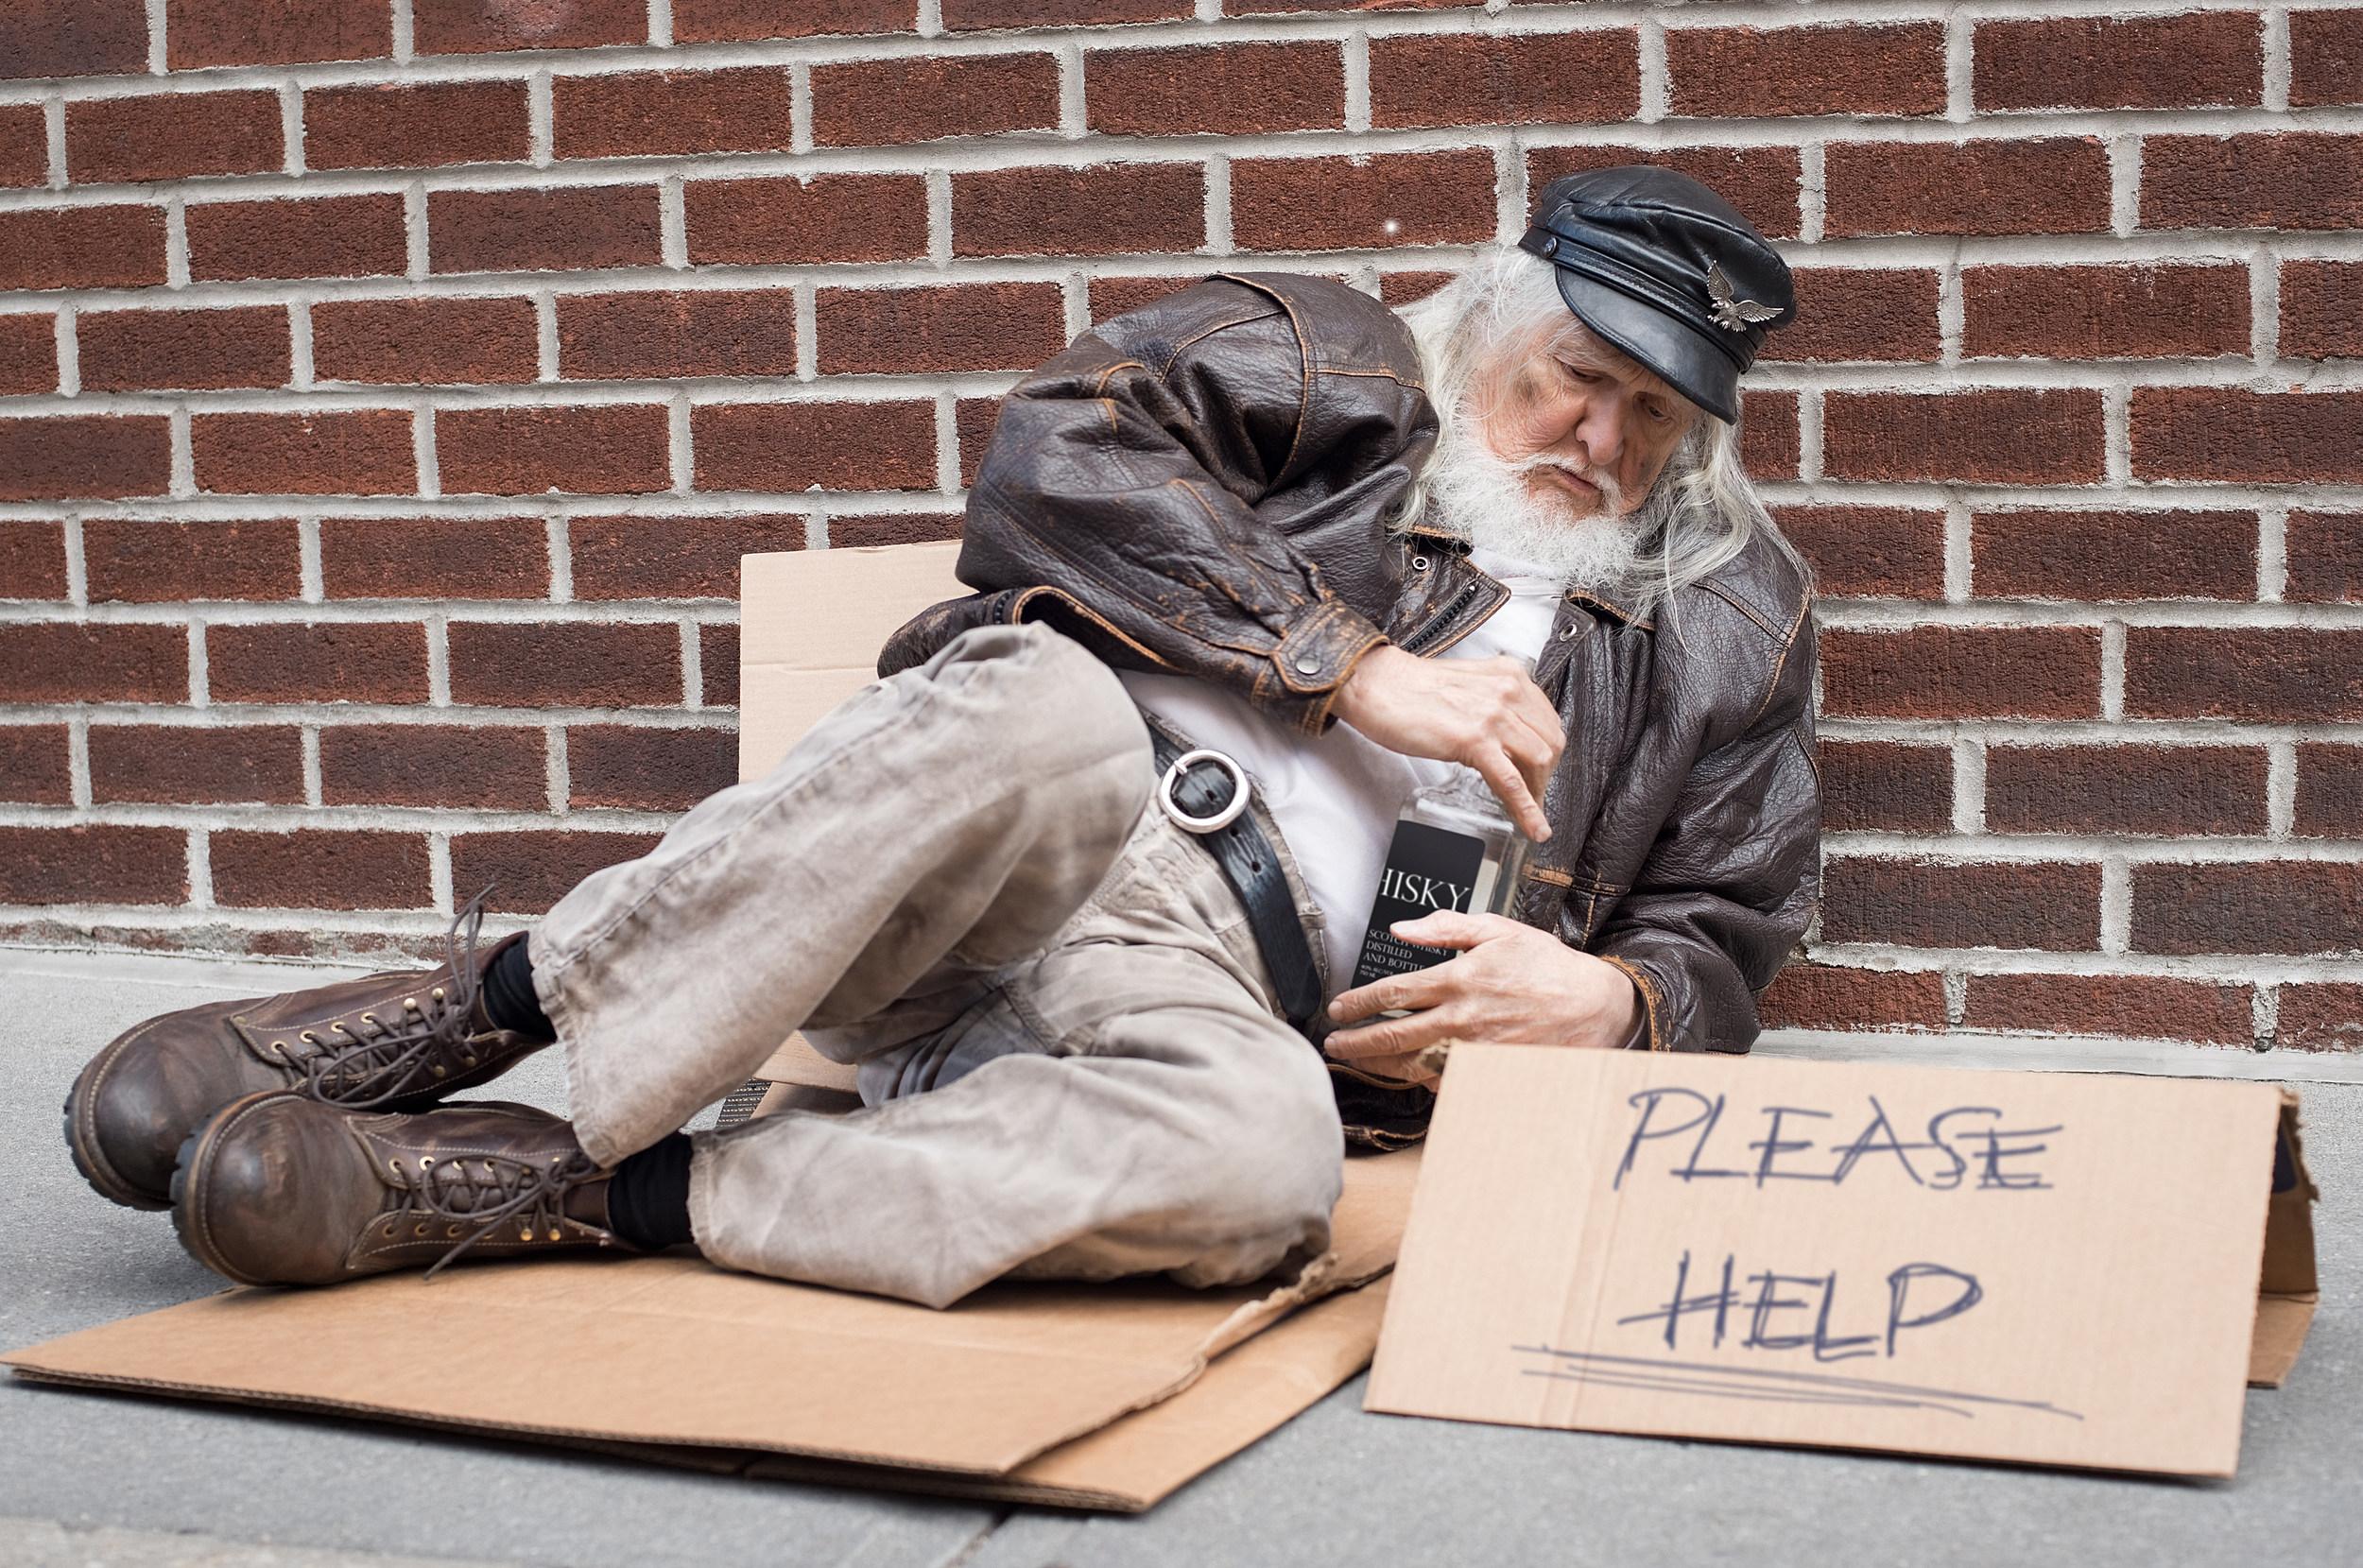 Homeless man sign Homeless man ask for help